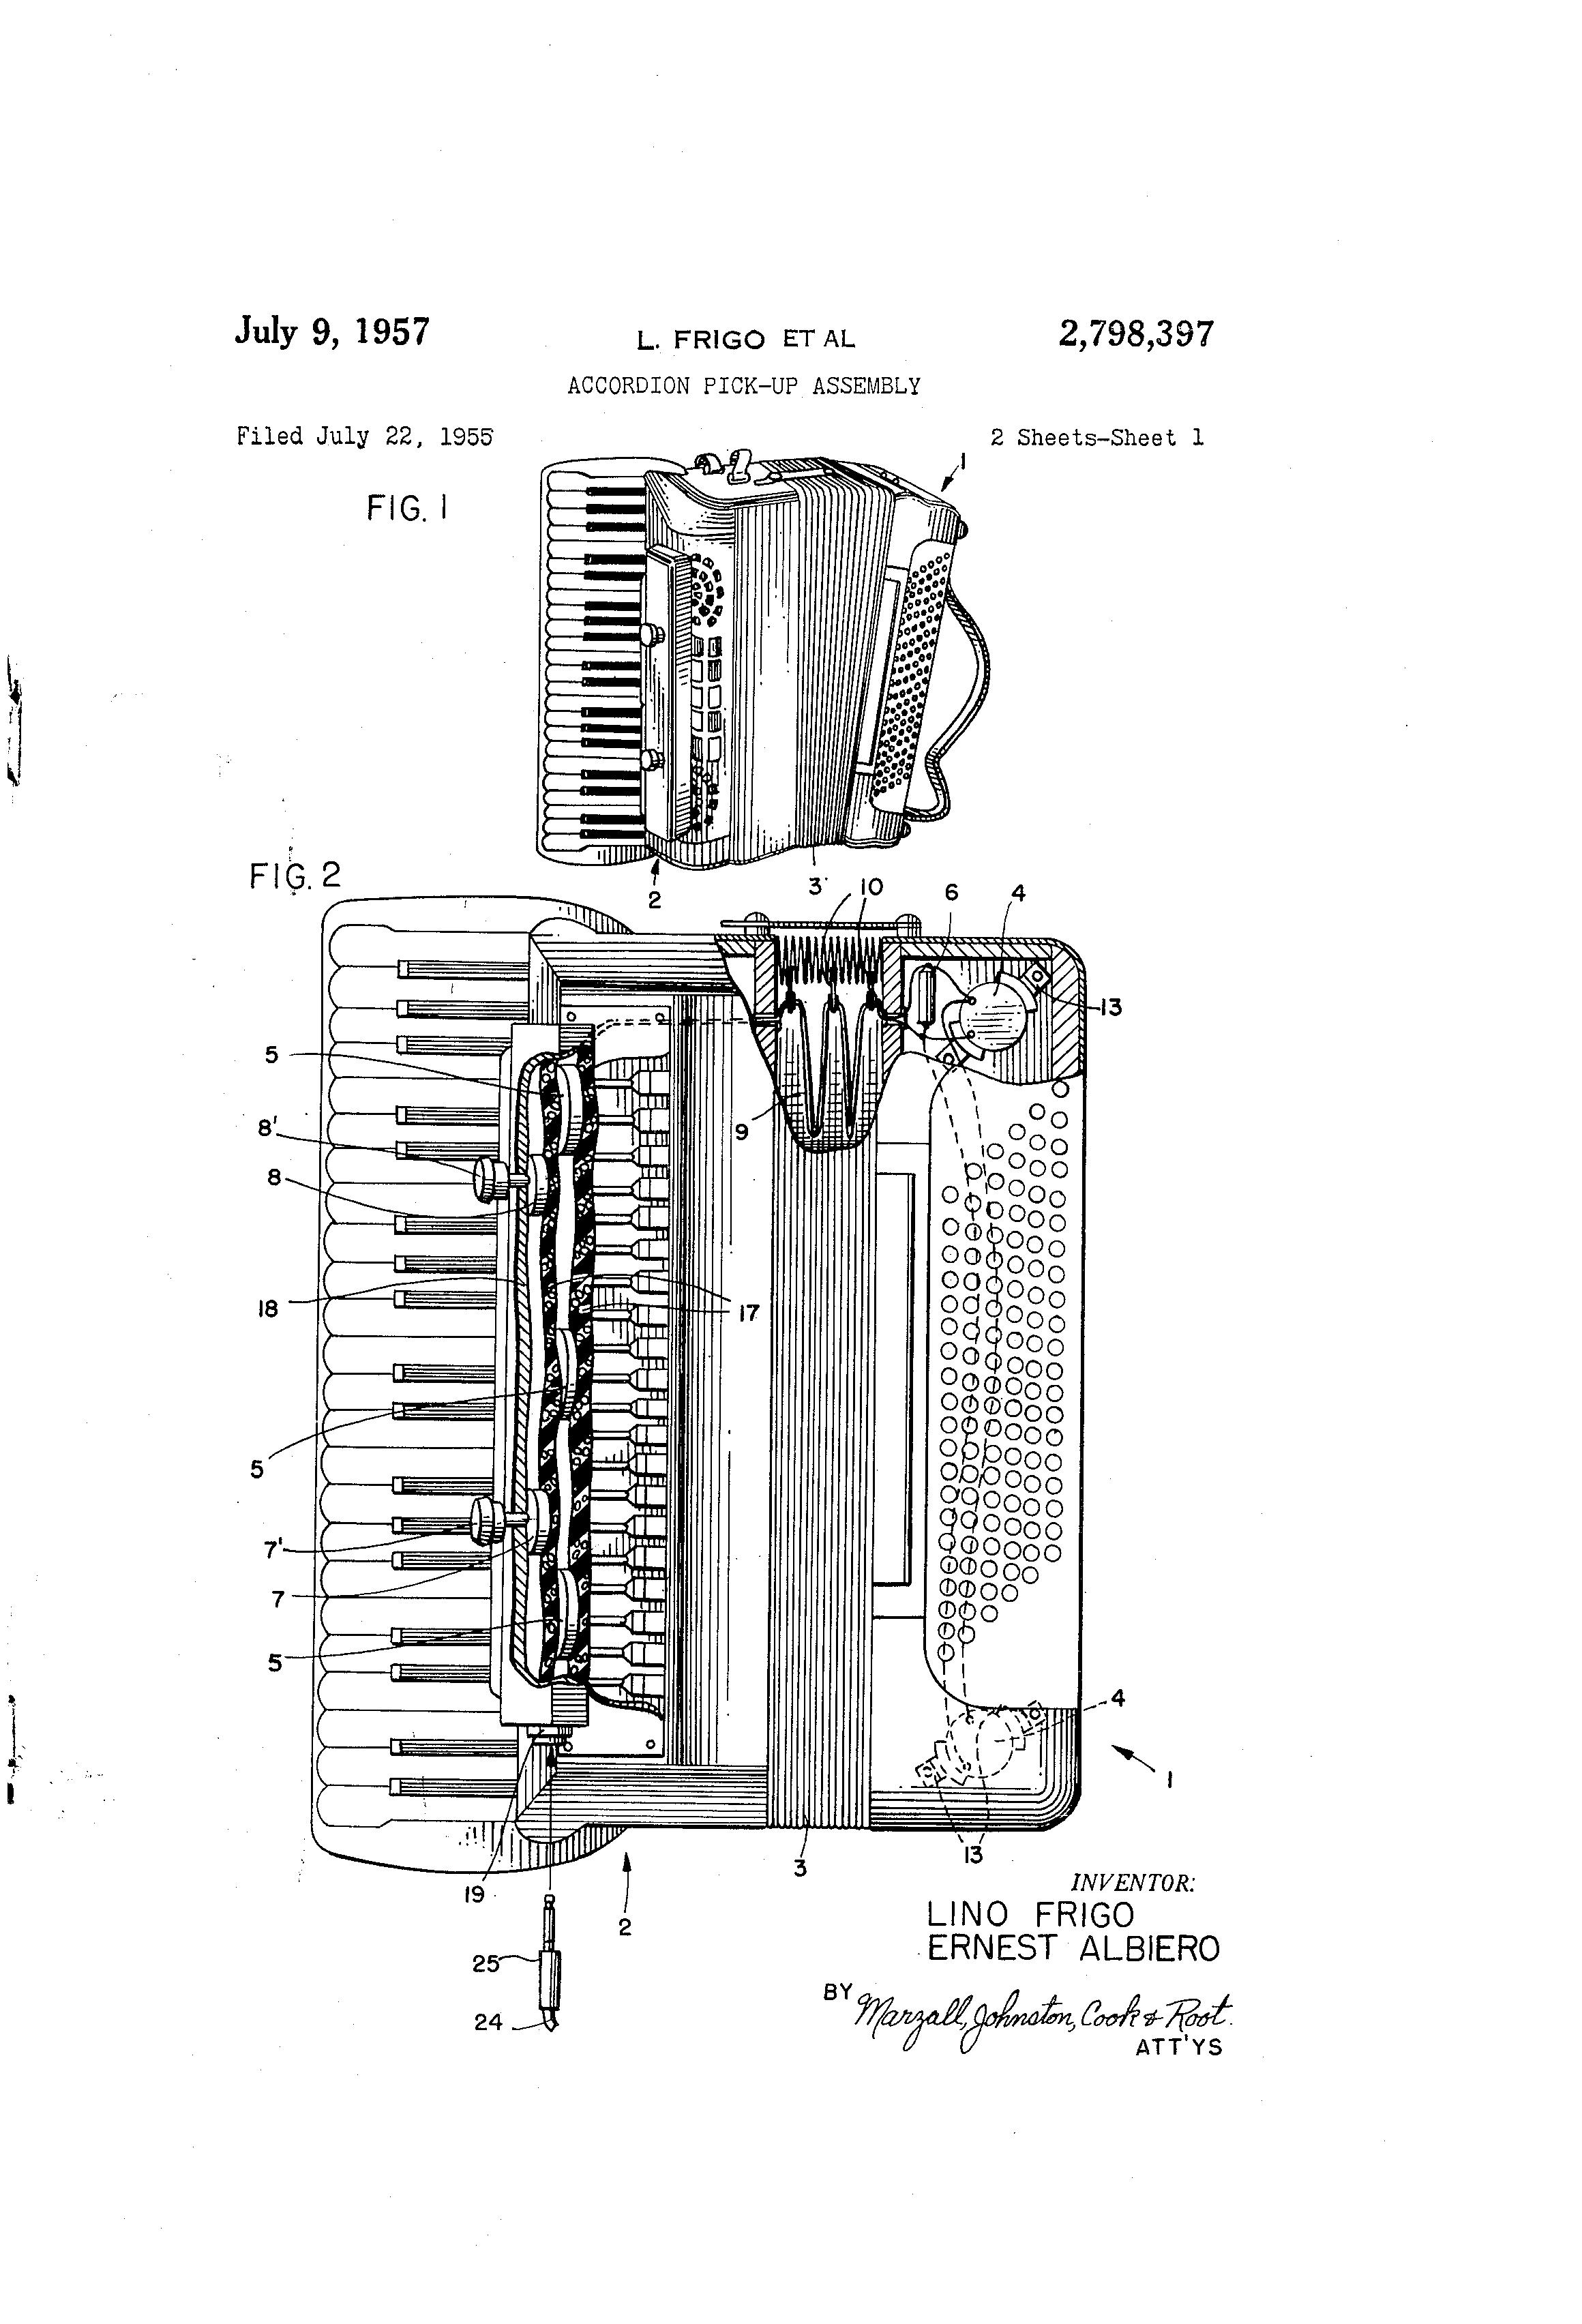 Patent US2798397 - Accordion pick-up assembly - Google Patents